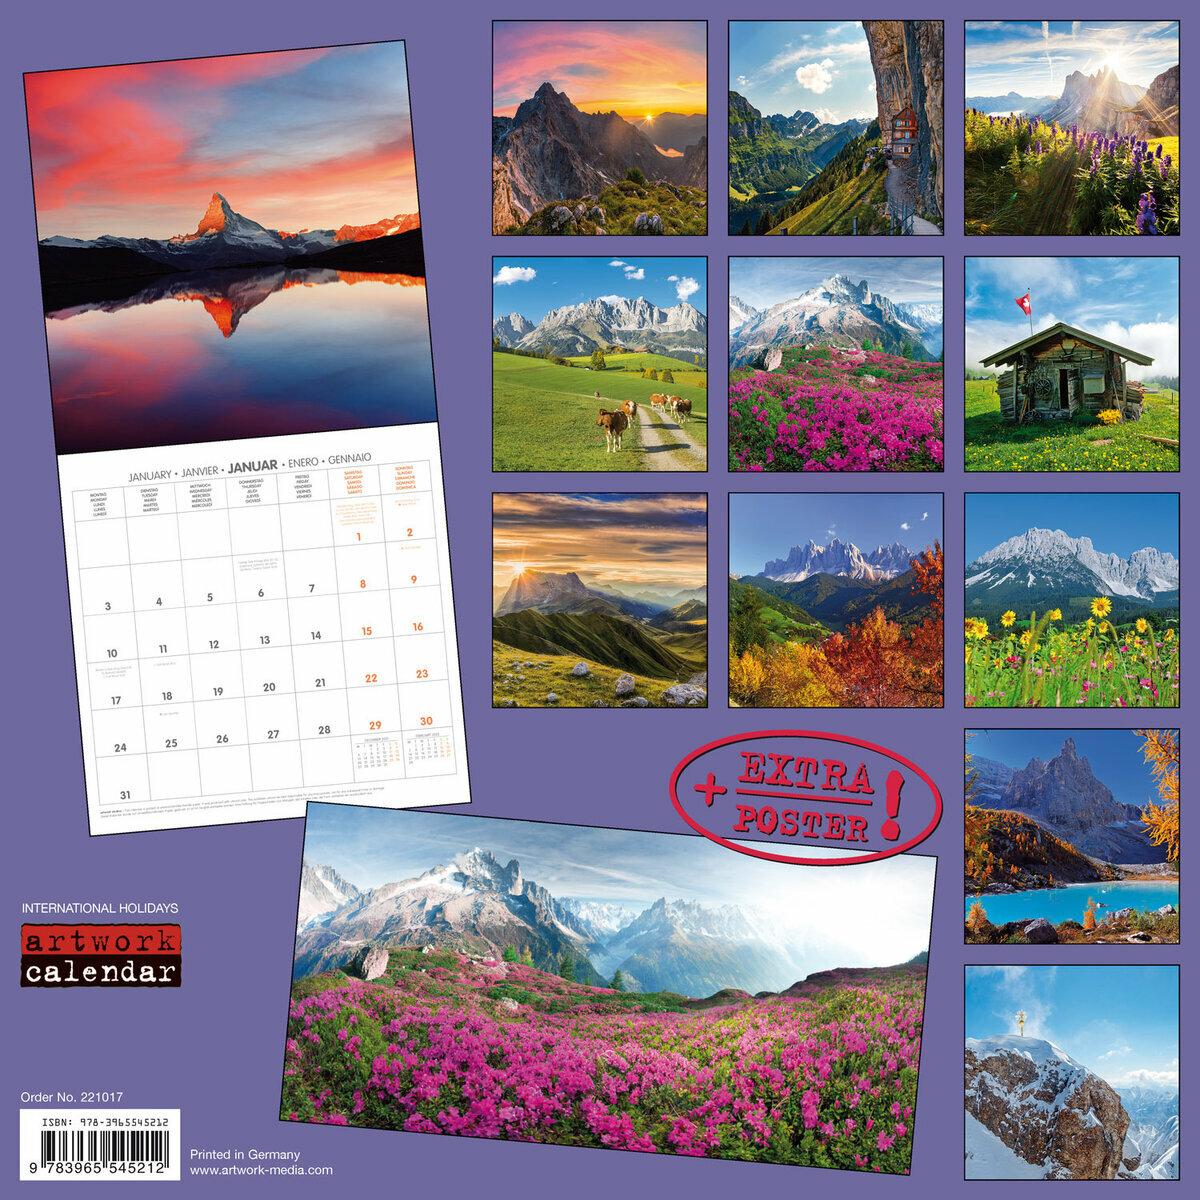 Calendrier Poste 2022 Calendrier 2022 Alpes AVEC POSTER OFFER